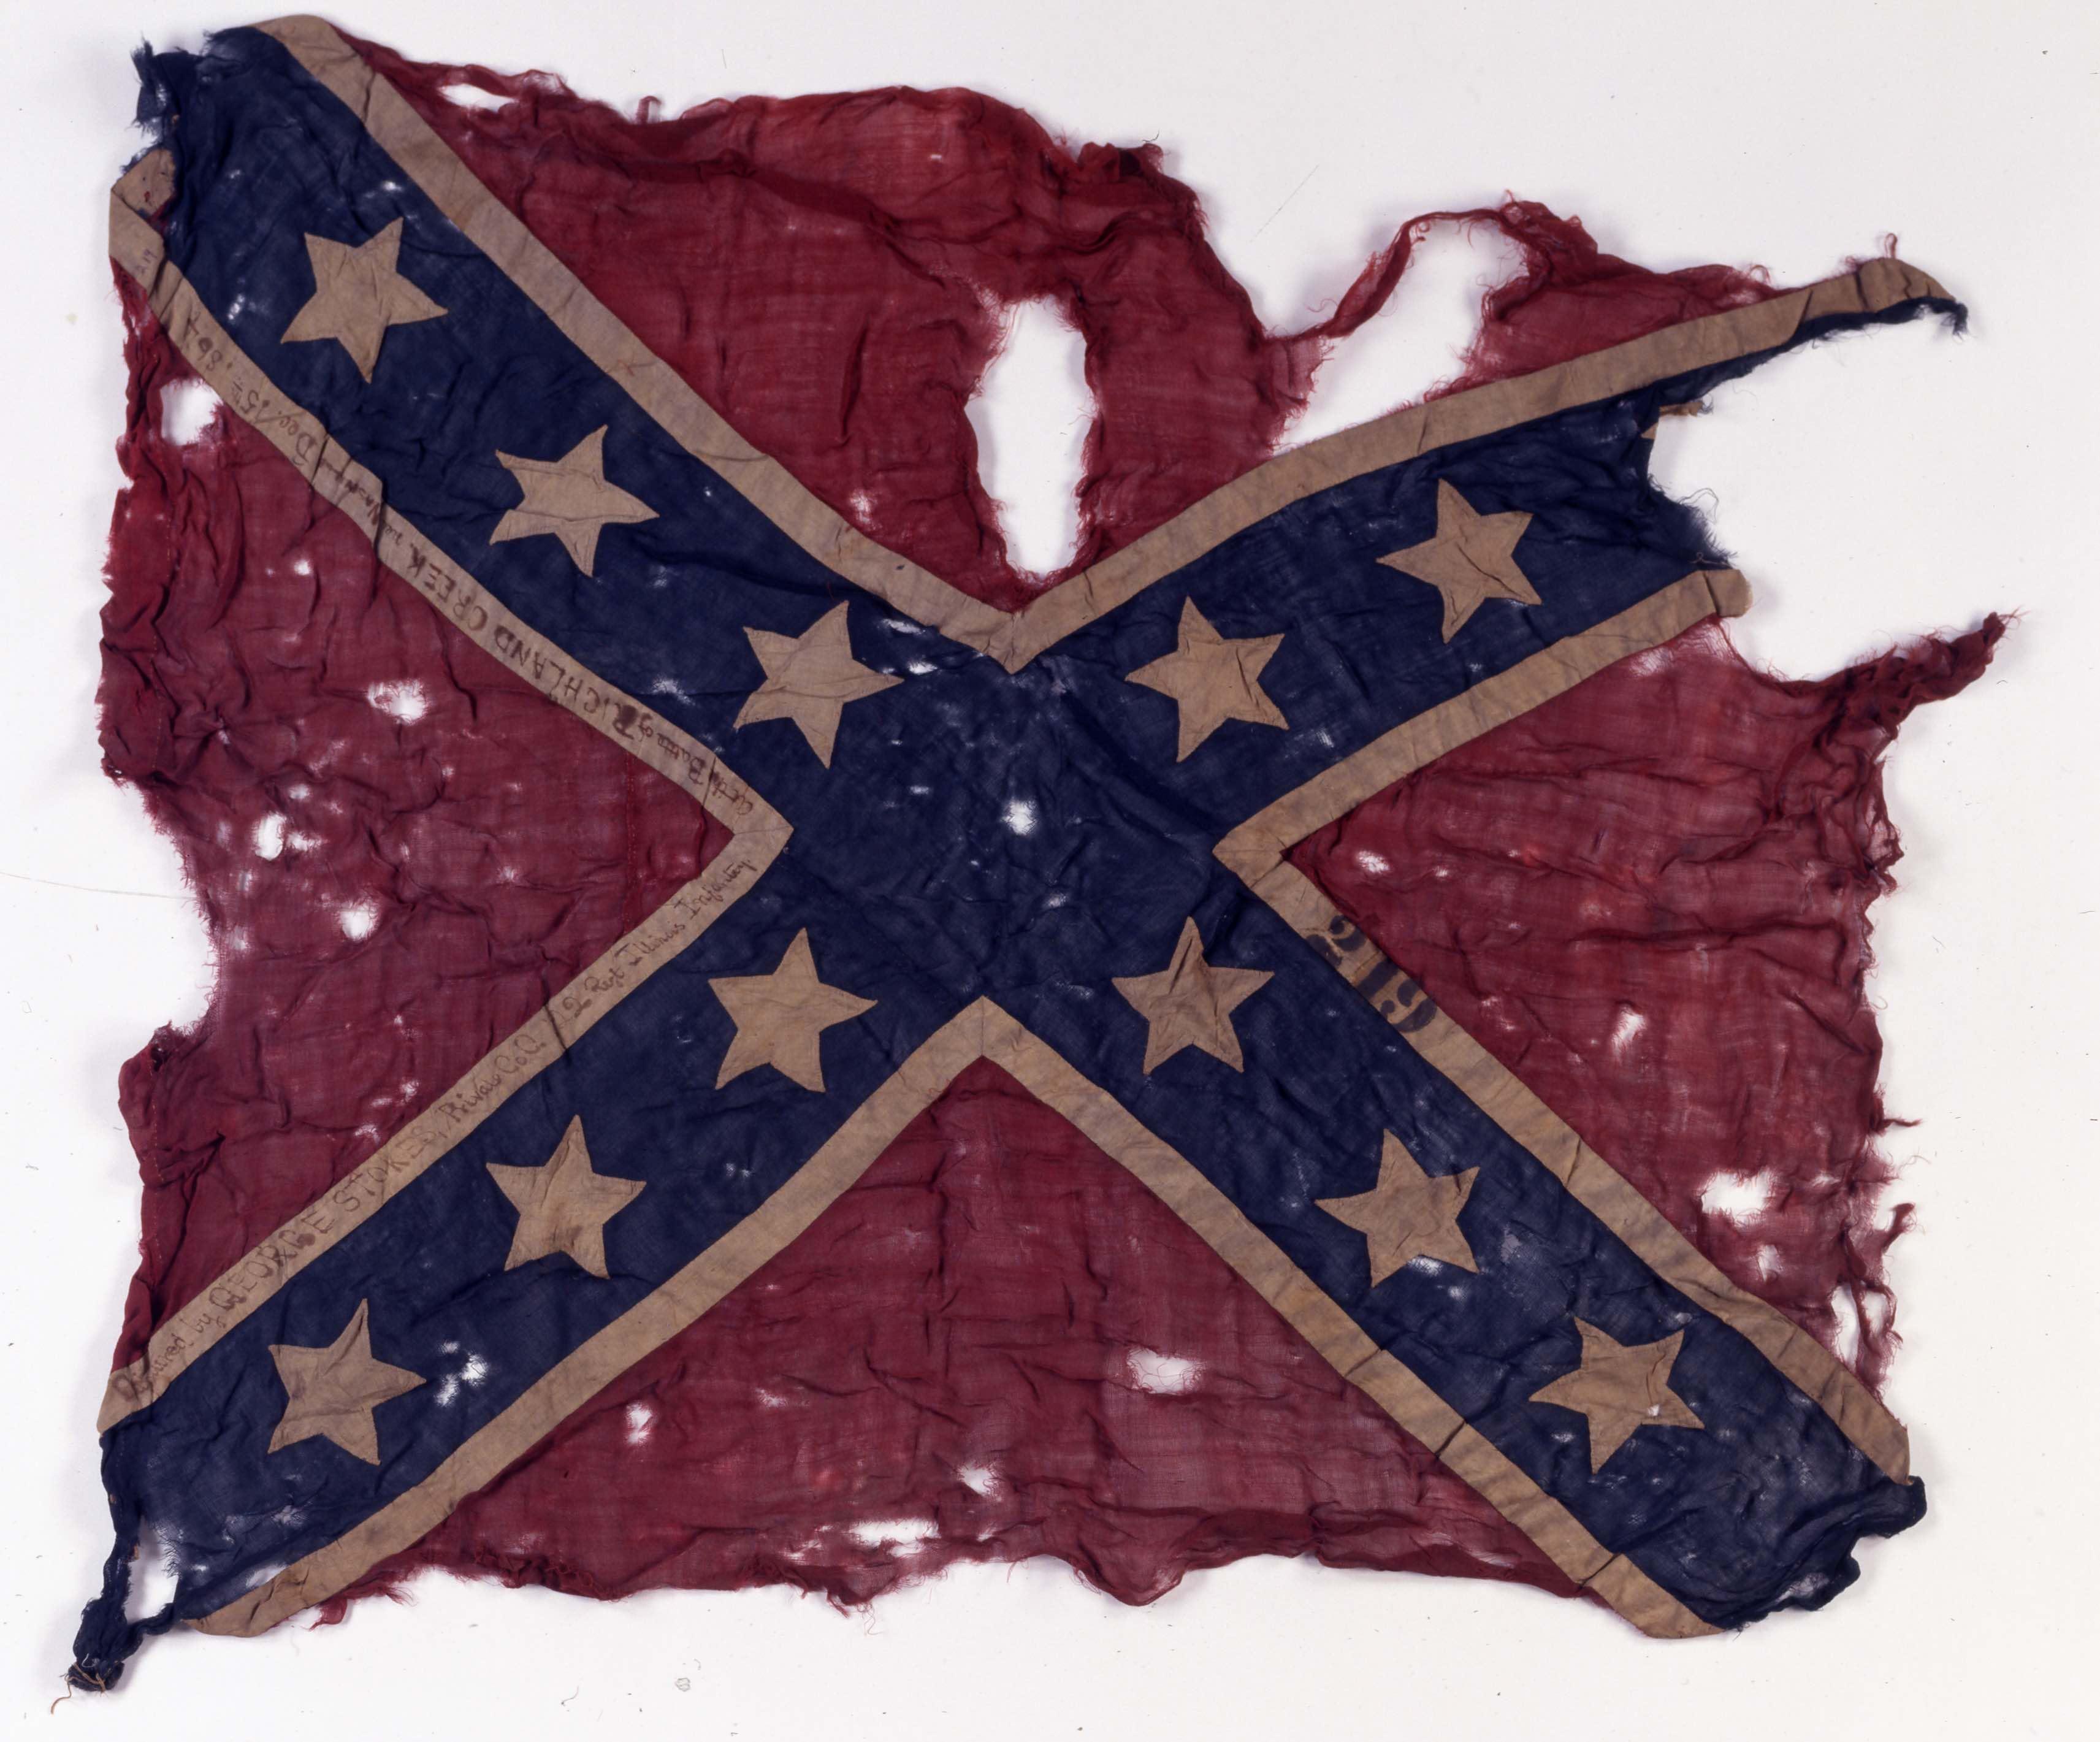 The Civil War Monitor